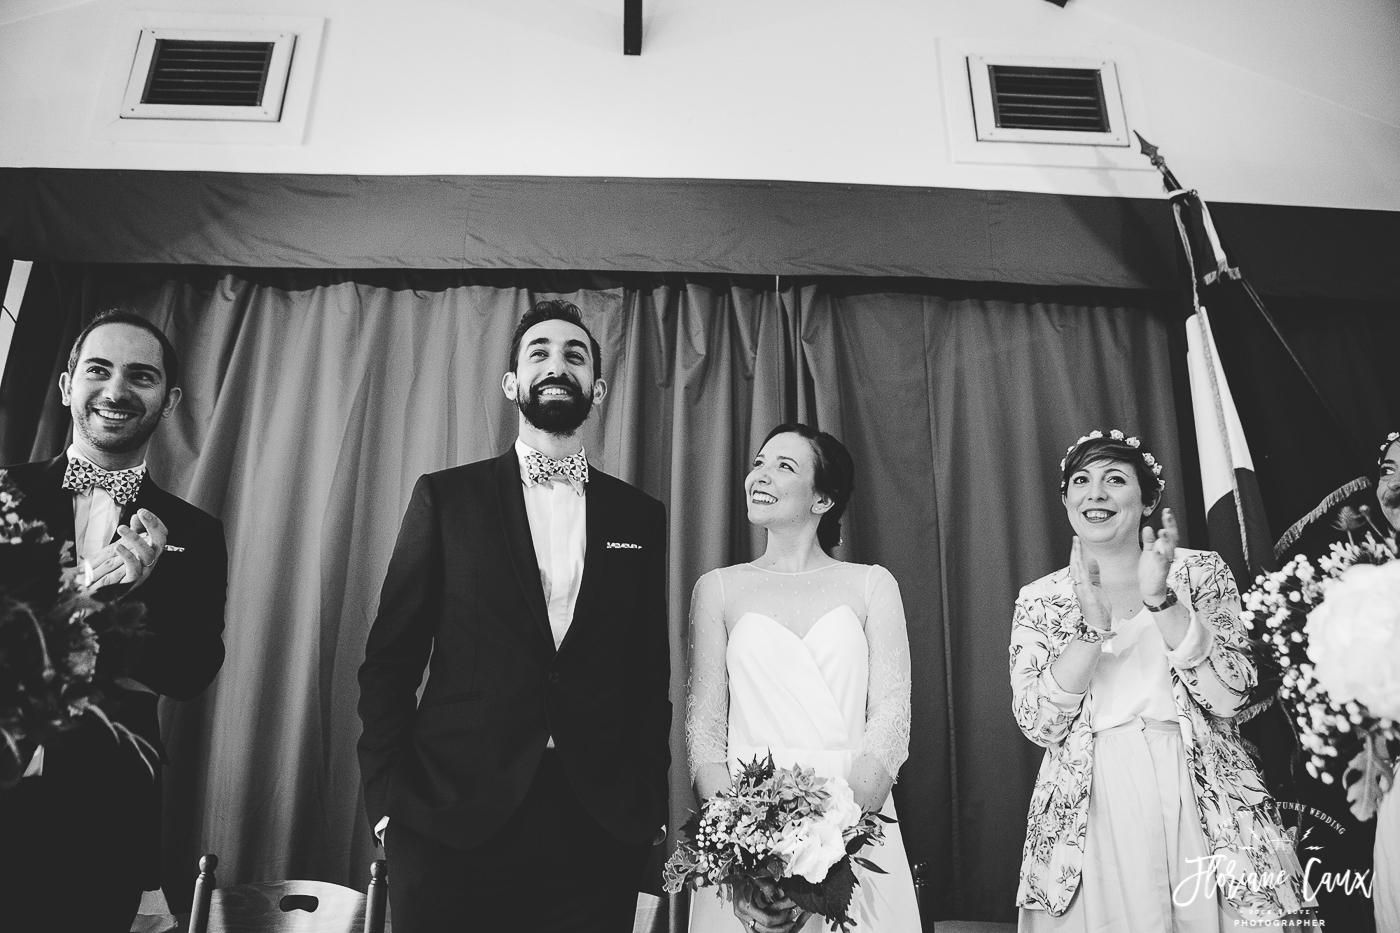 photographe-mariage-pays-basque-Floriane-Caux (18)